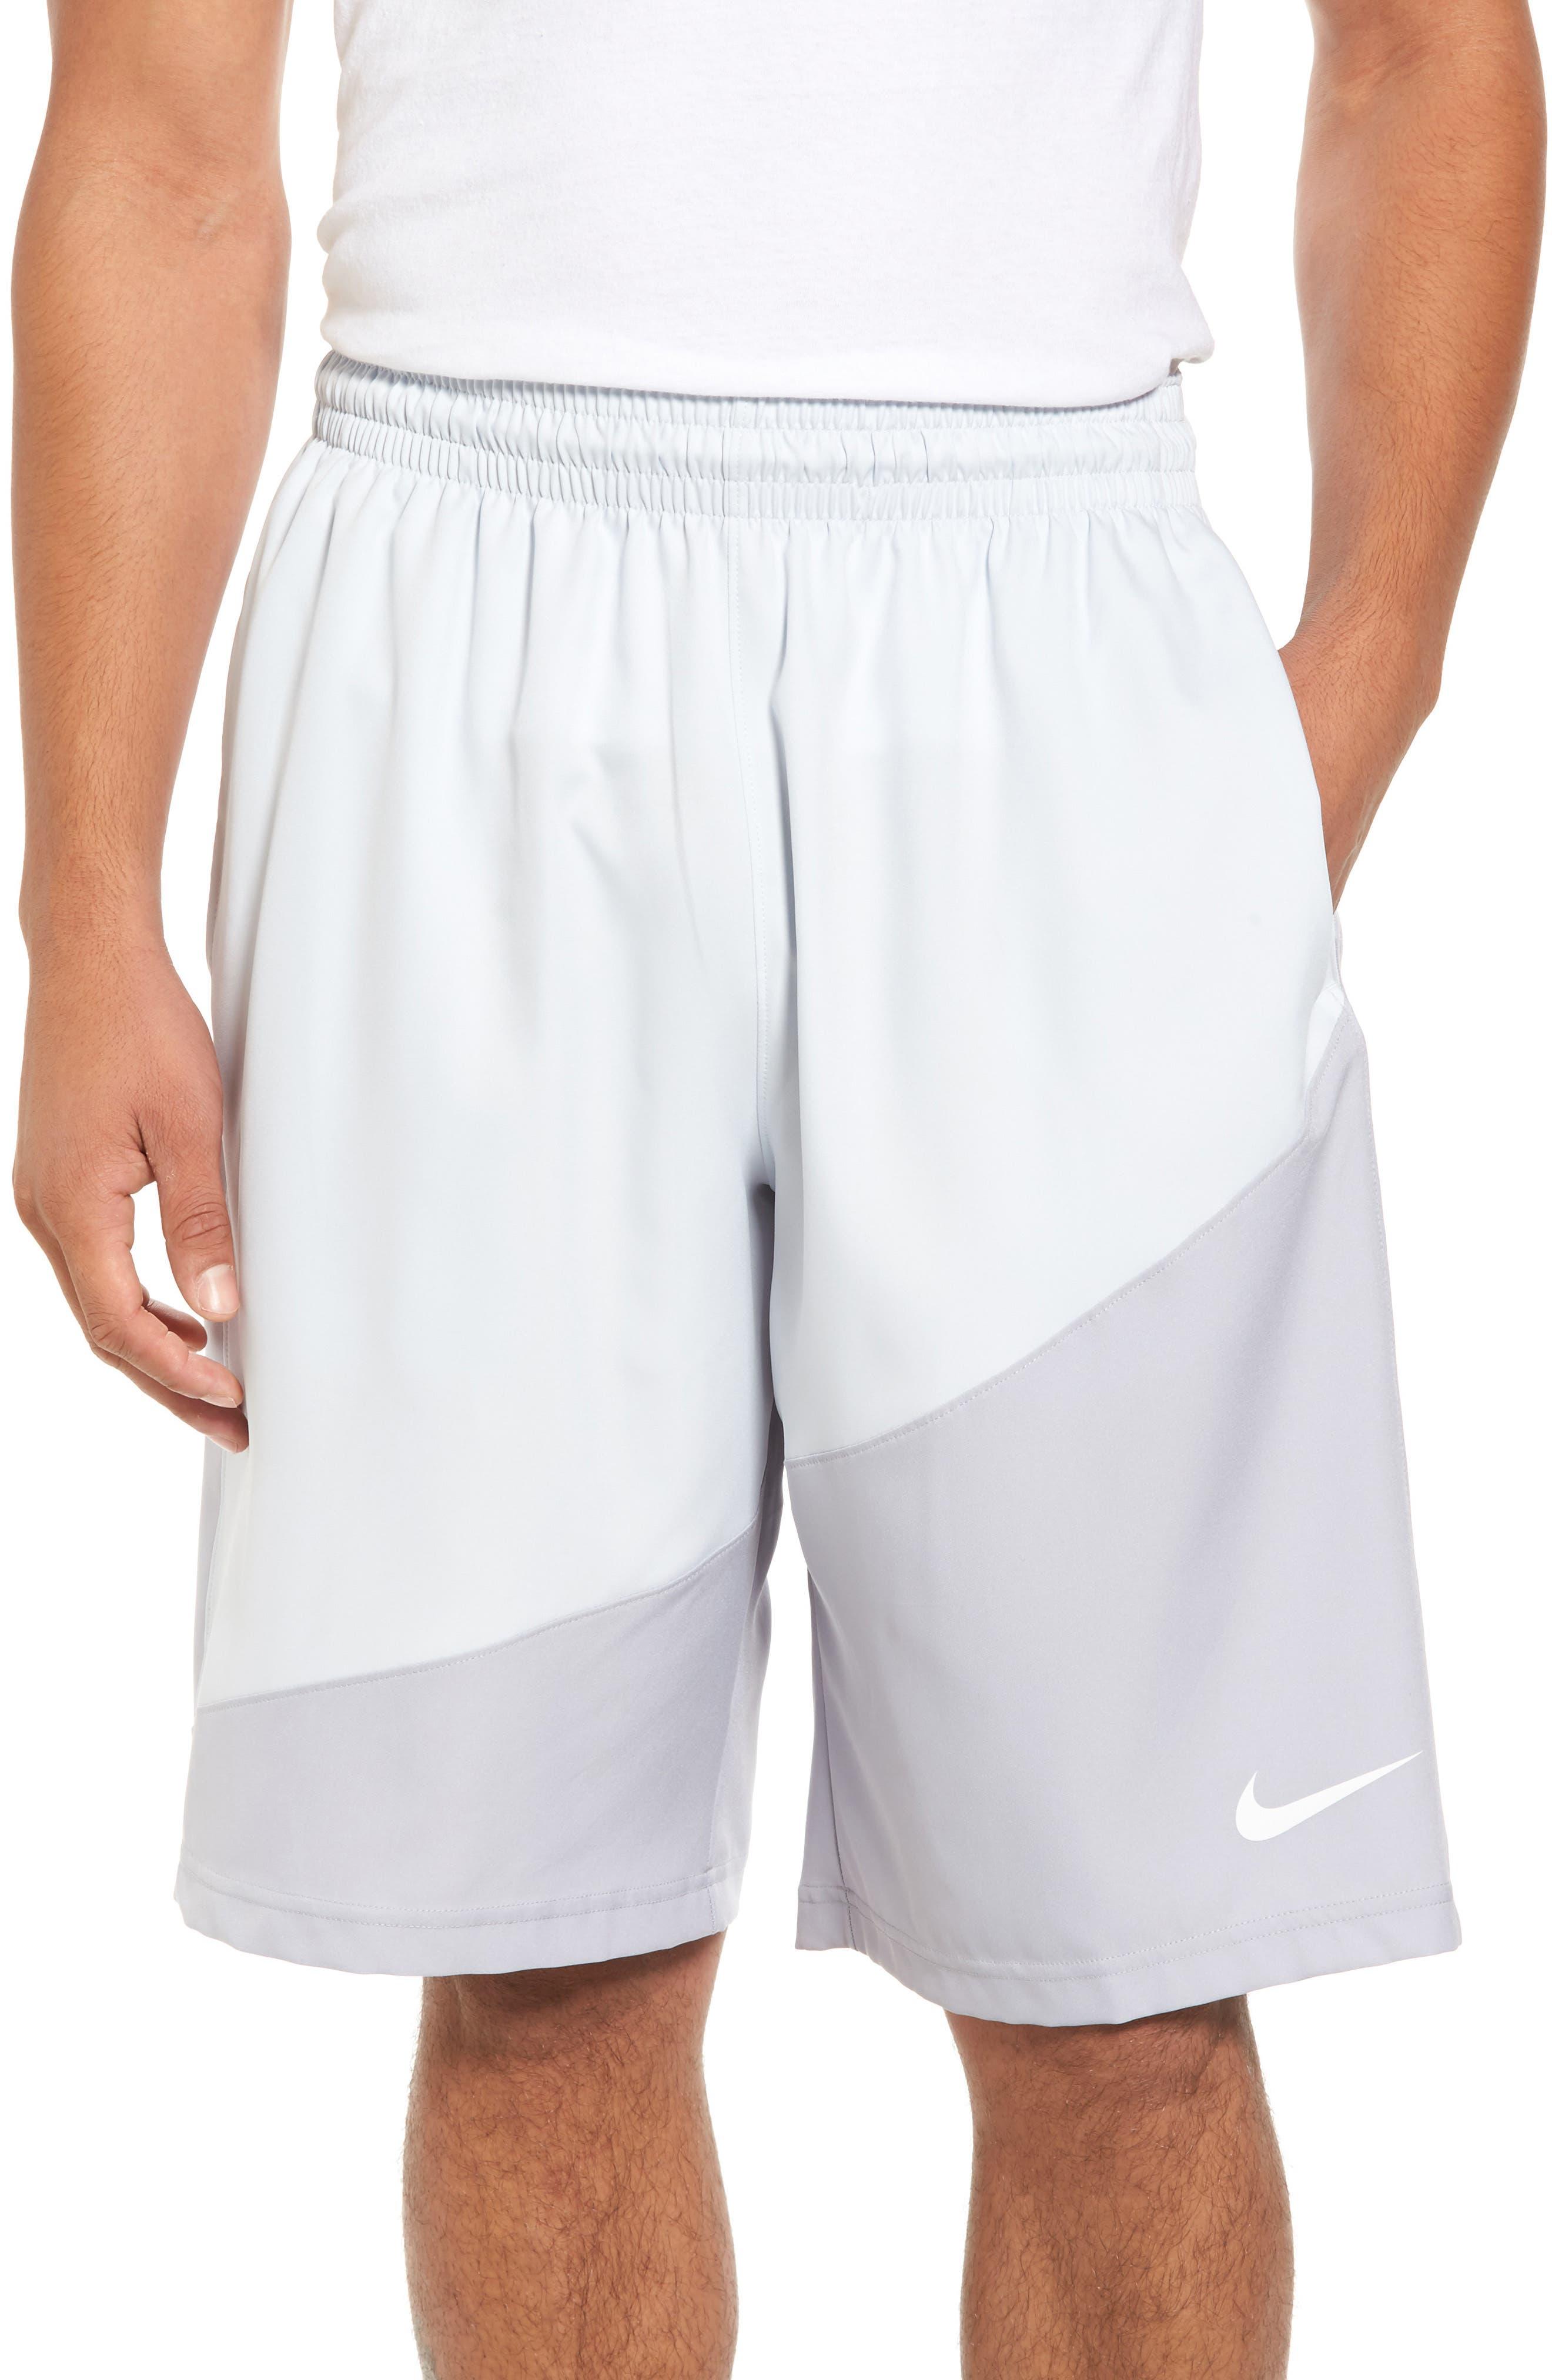 Dry Shorts,                         Main,                         color, Atmosphere Grey/ Smoke/ Black